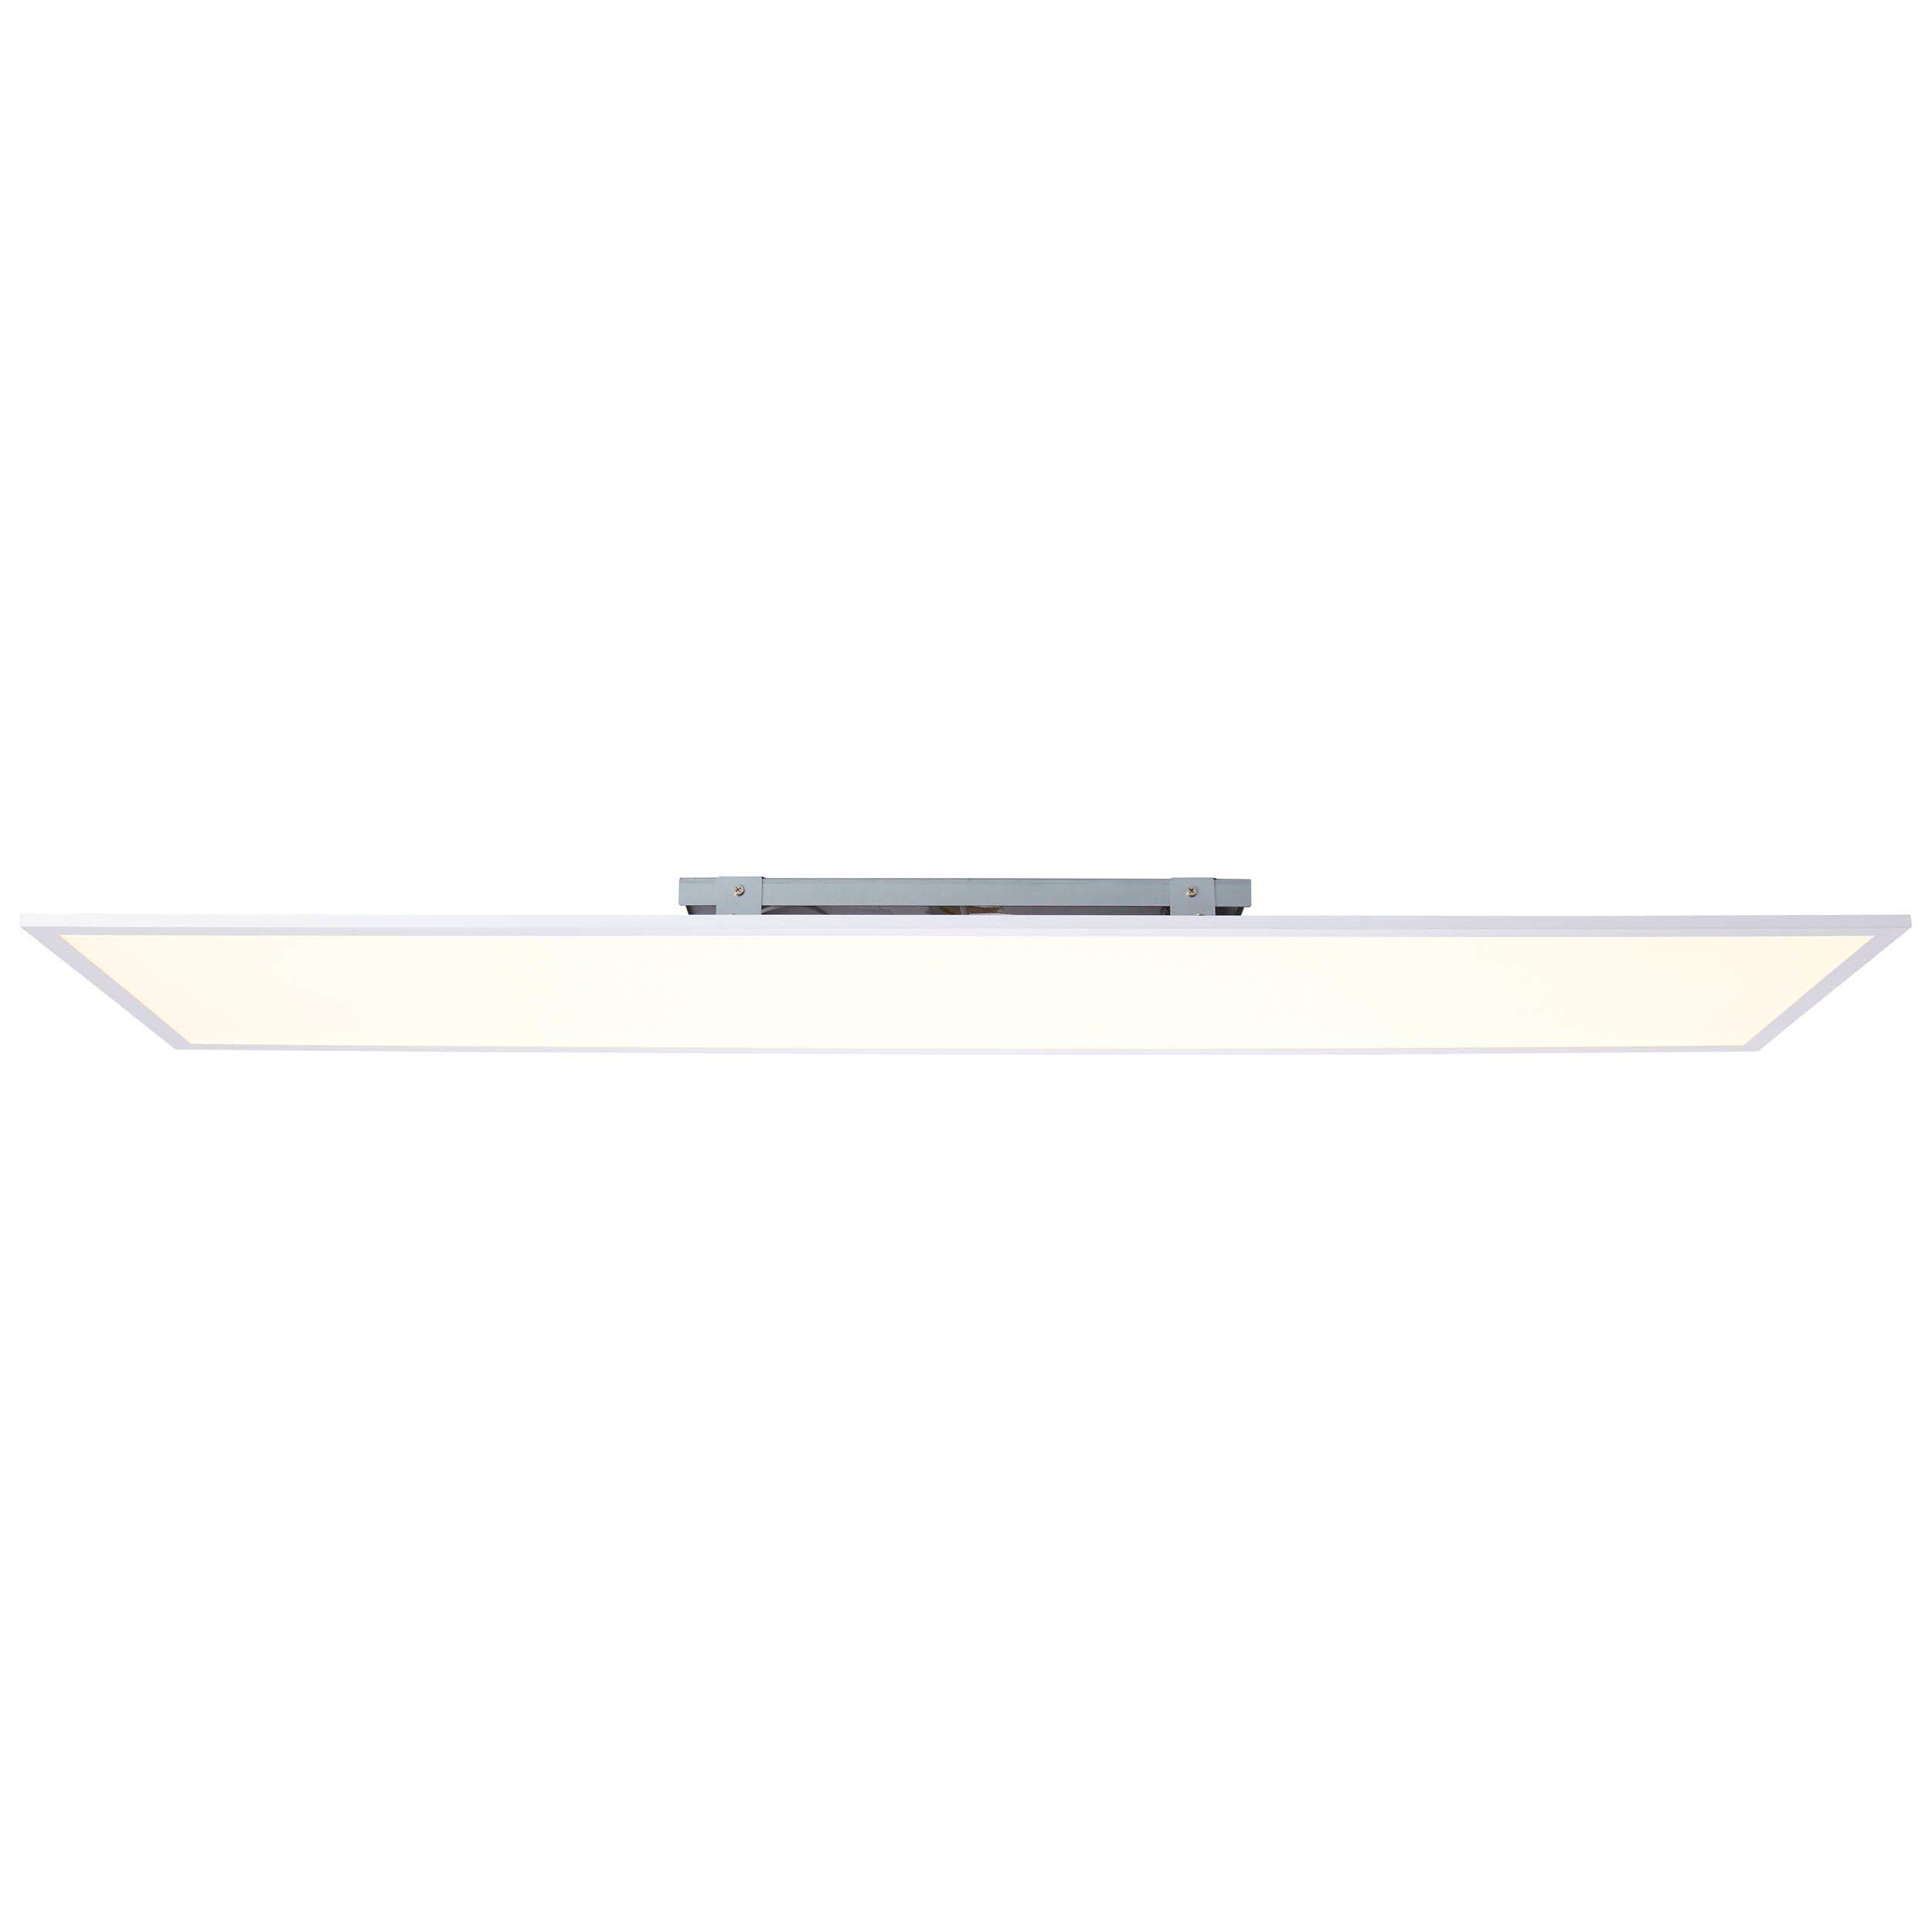 Brilliant Leuchten Charla LED Deckenaufbau-Paneel 120x30cm weiß